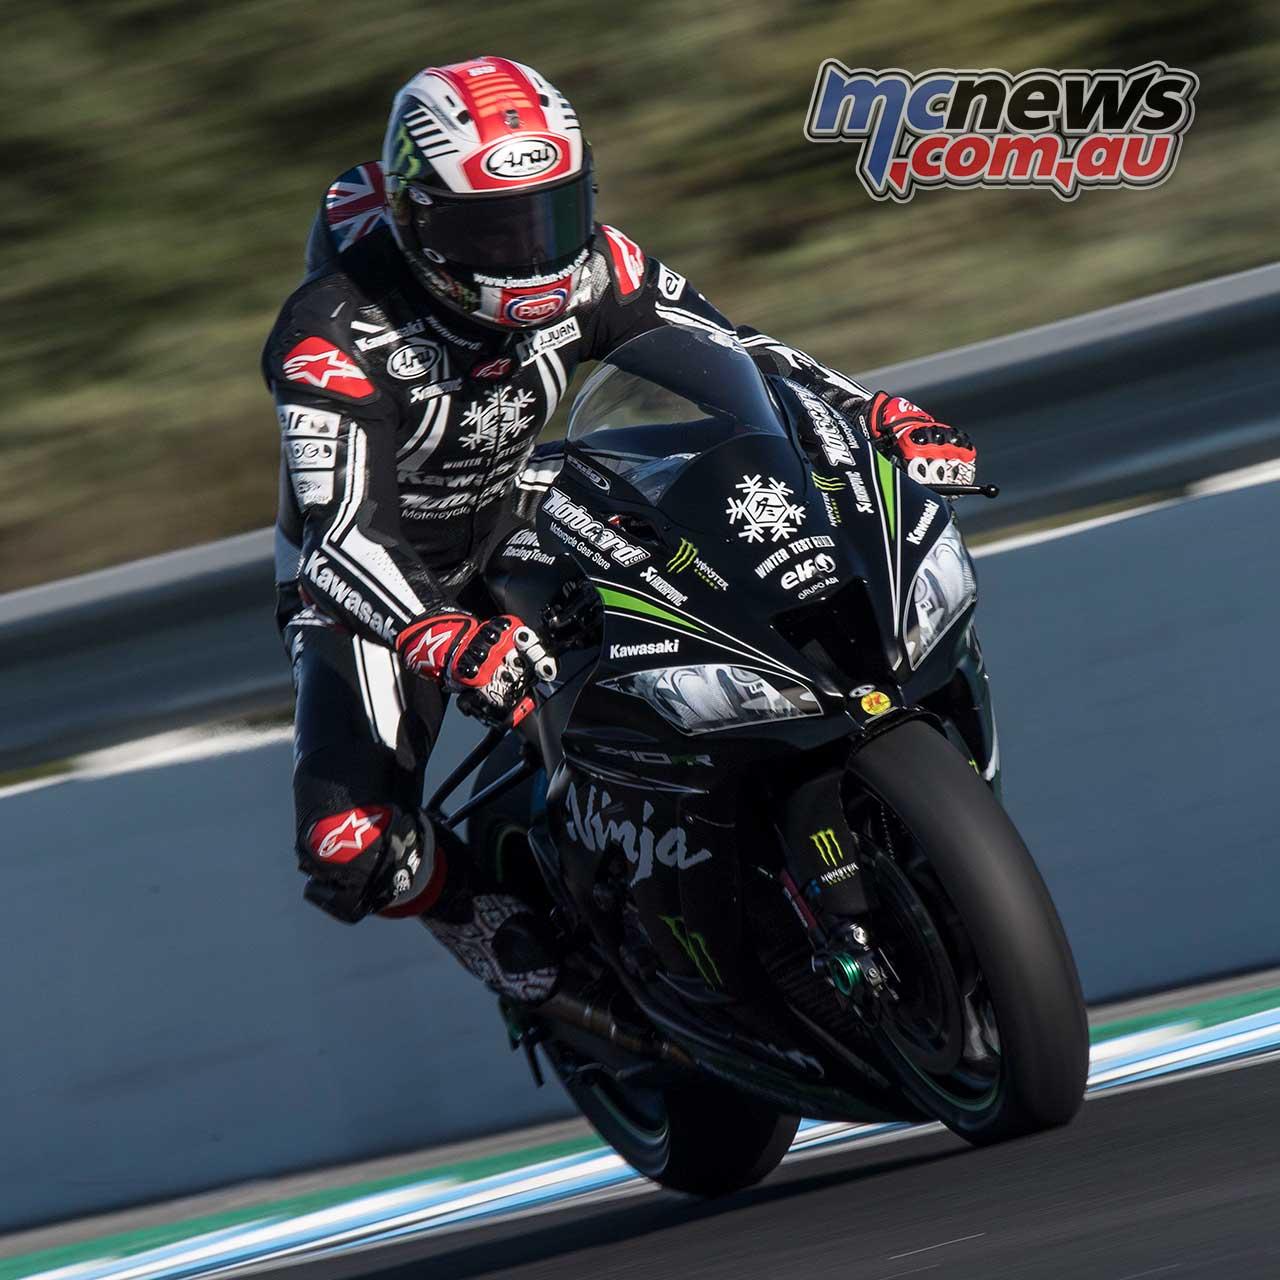 Jonathan Rea faster than MotoGP Riders at Jerez | MCNews.com.au